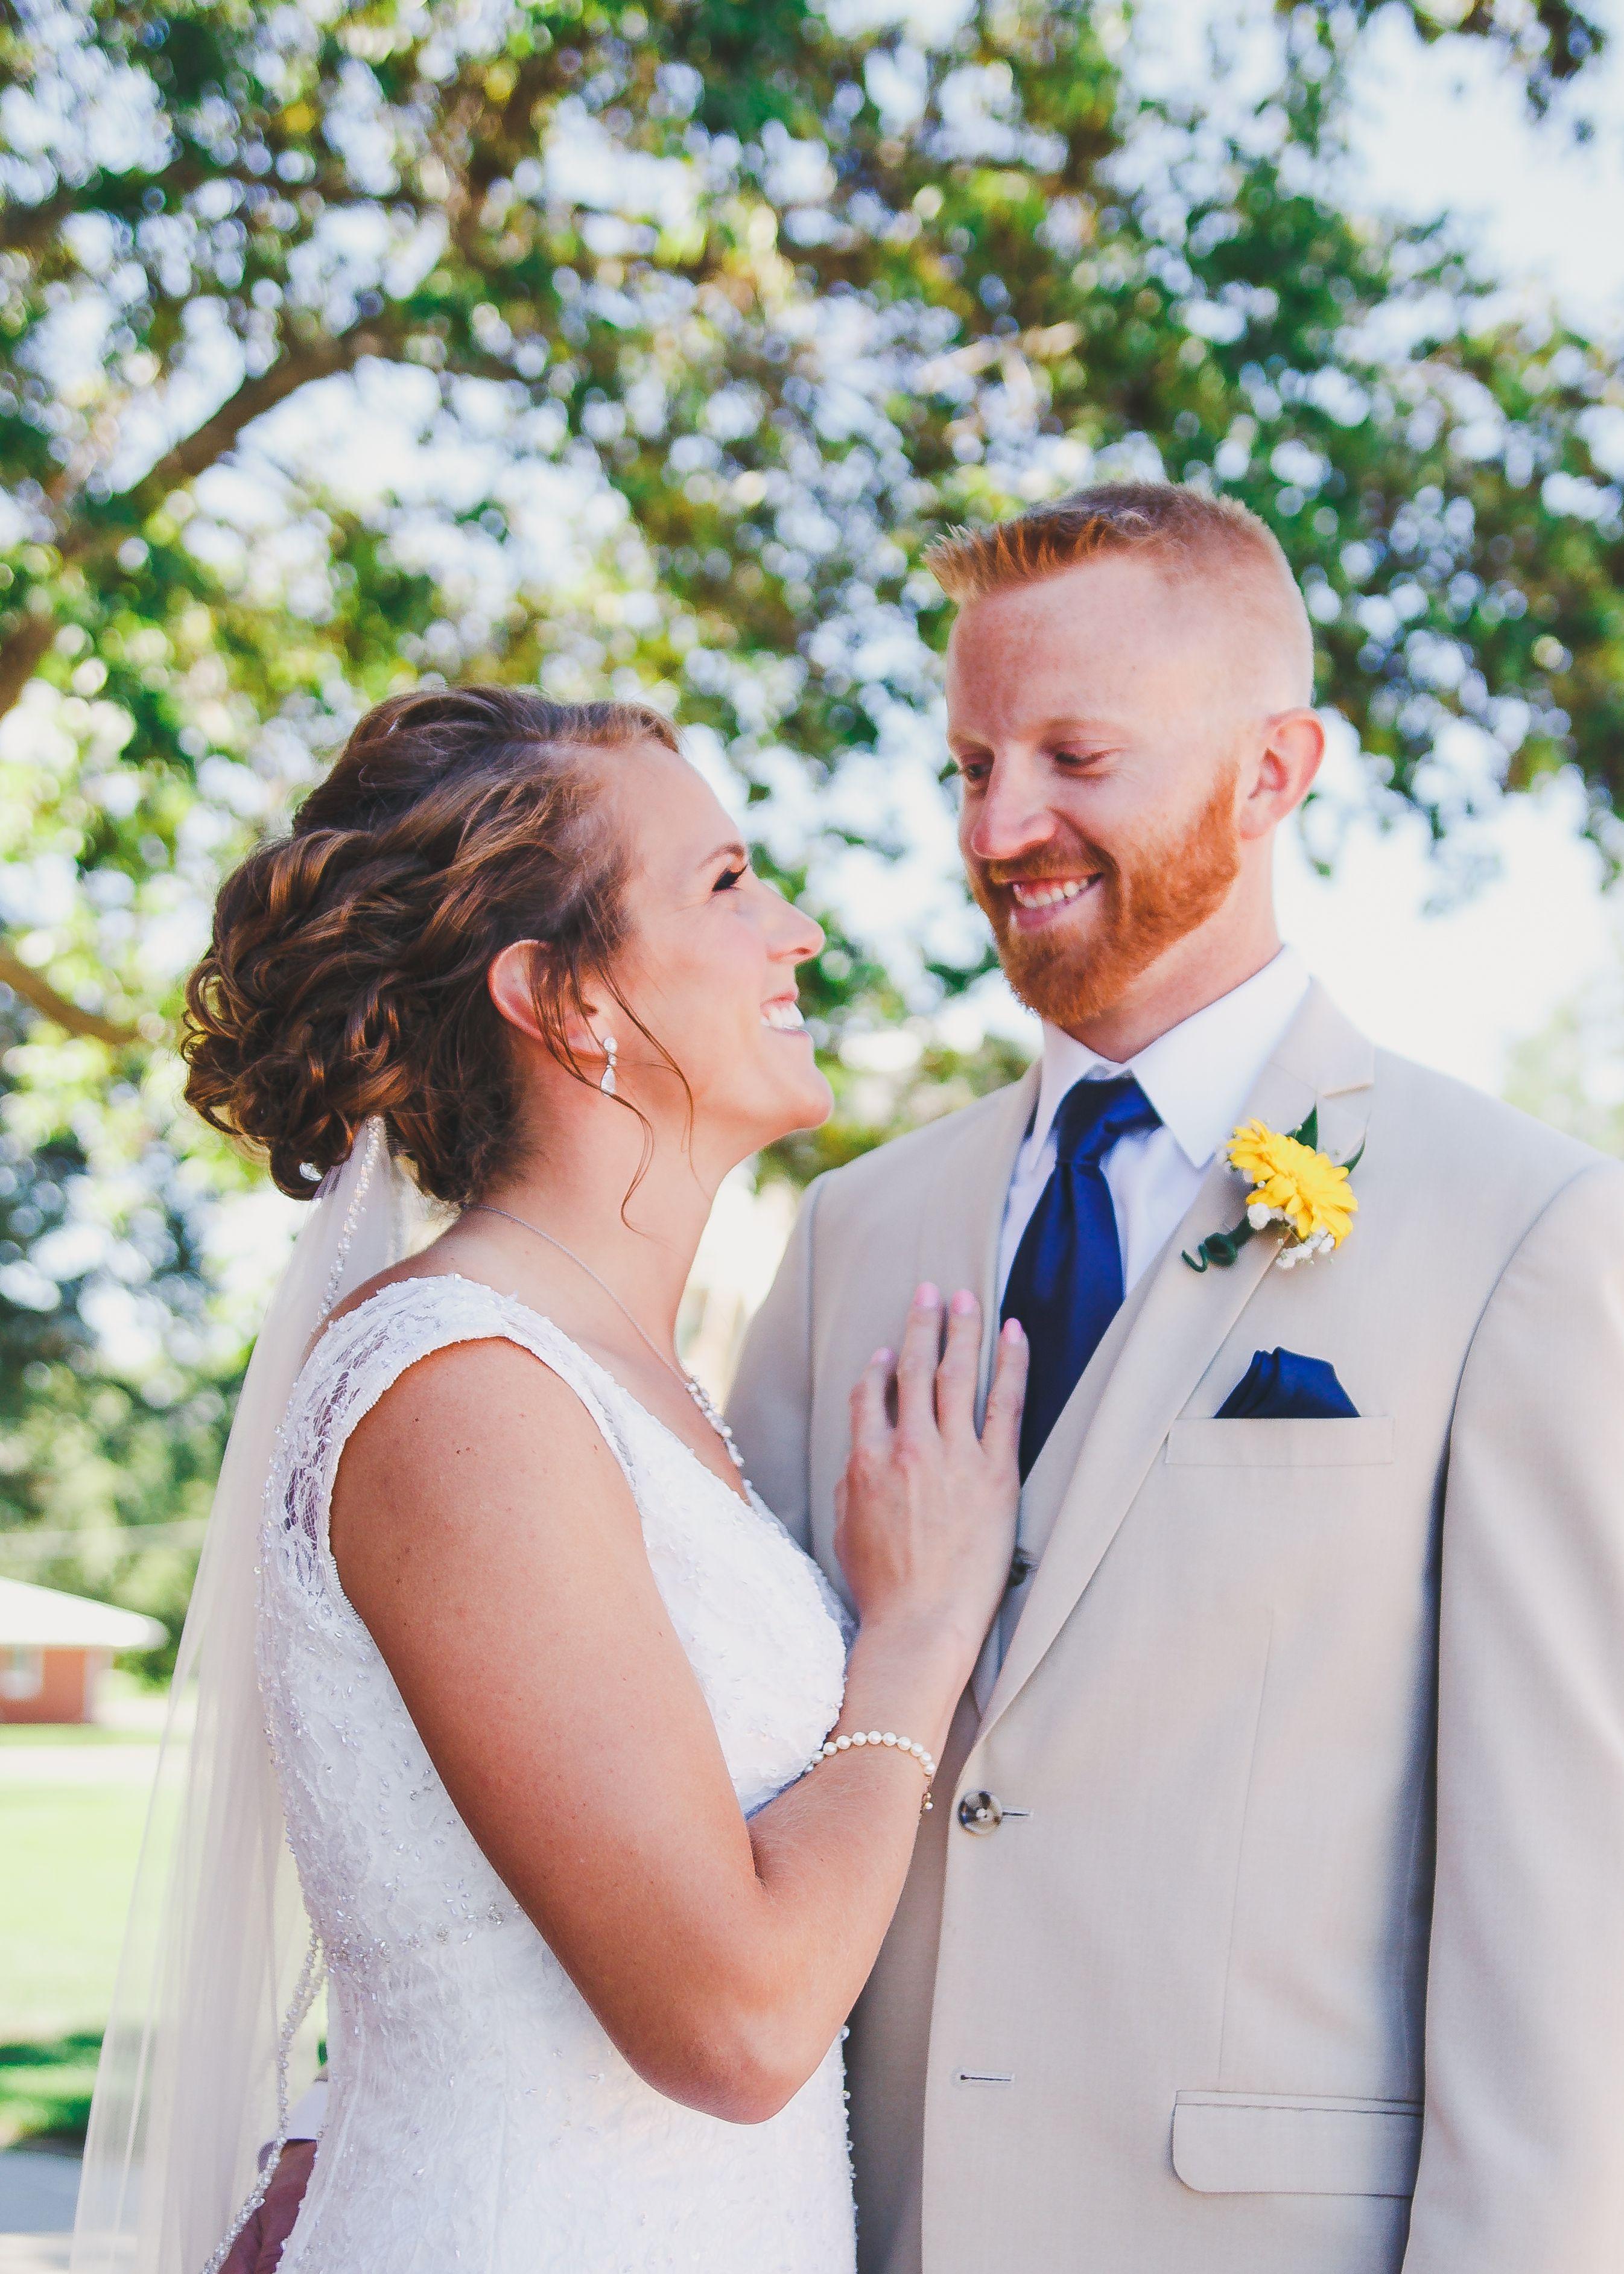 Simply Radiant Weddings | Photographer Veronica Bolinger | Fall 2015 | September Wedding